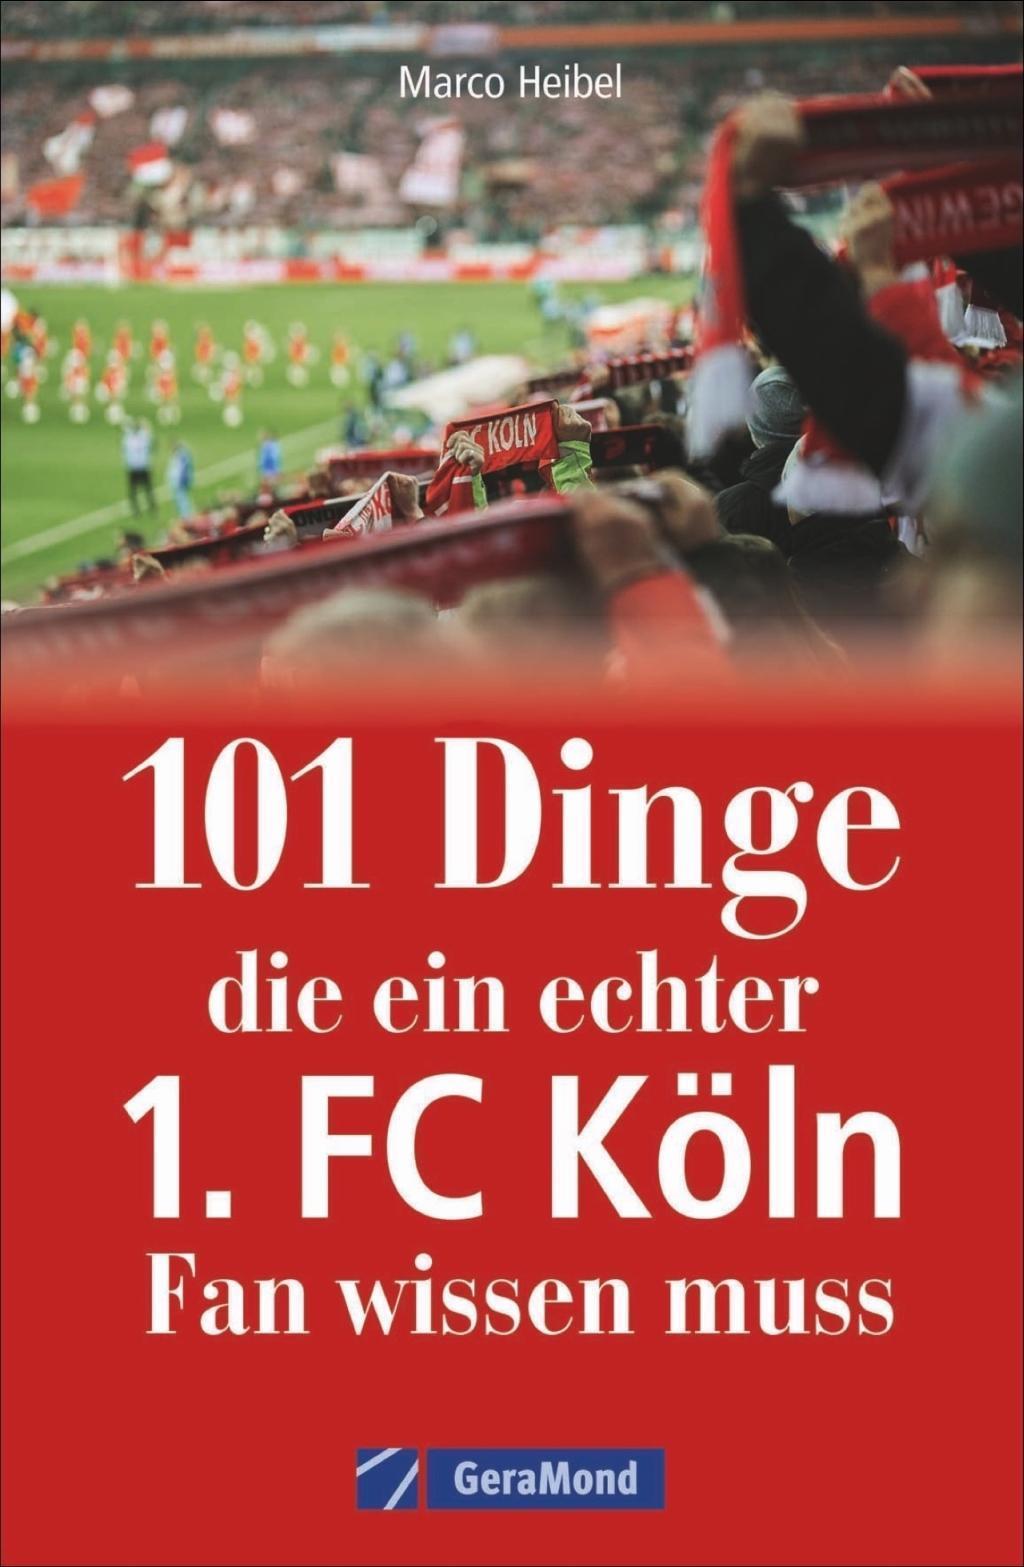 1 FC K/öln Keks-Stempel-Set .